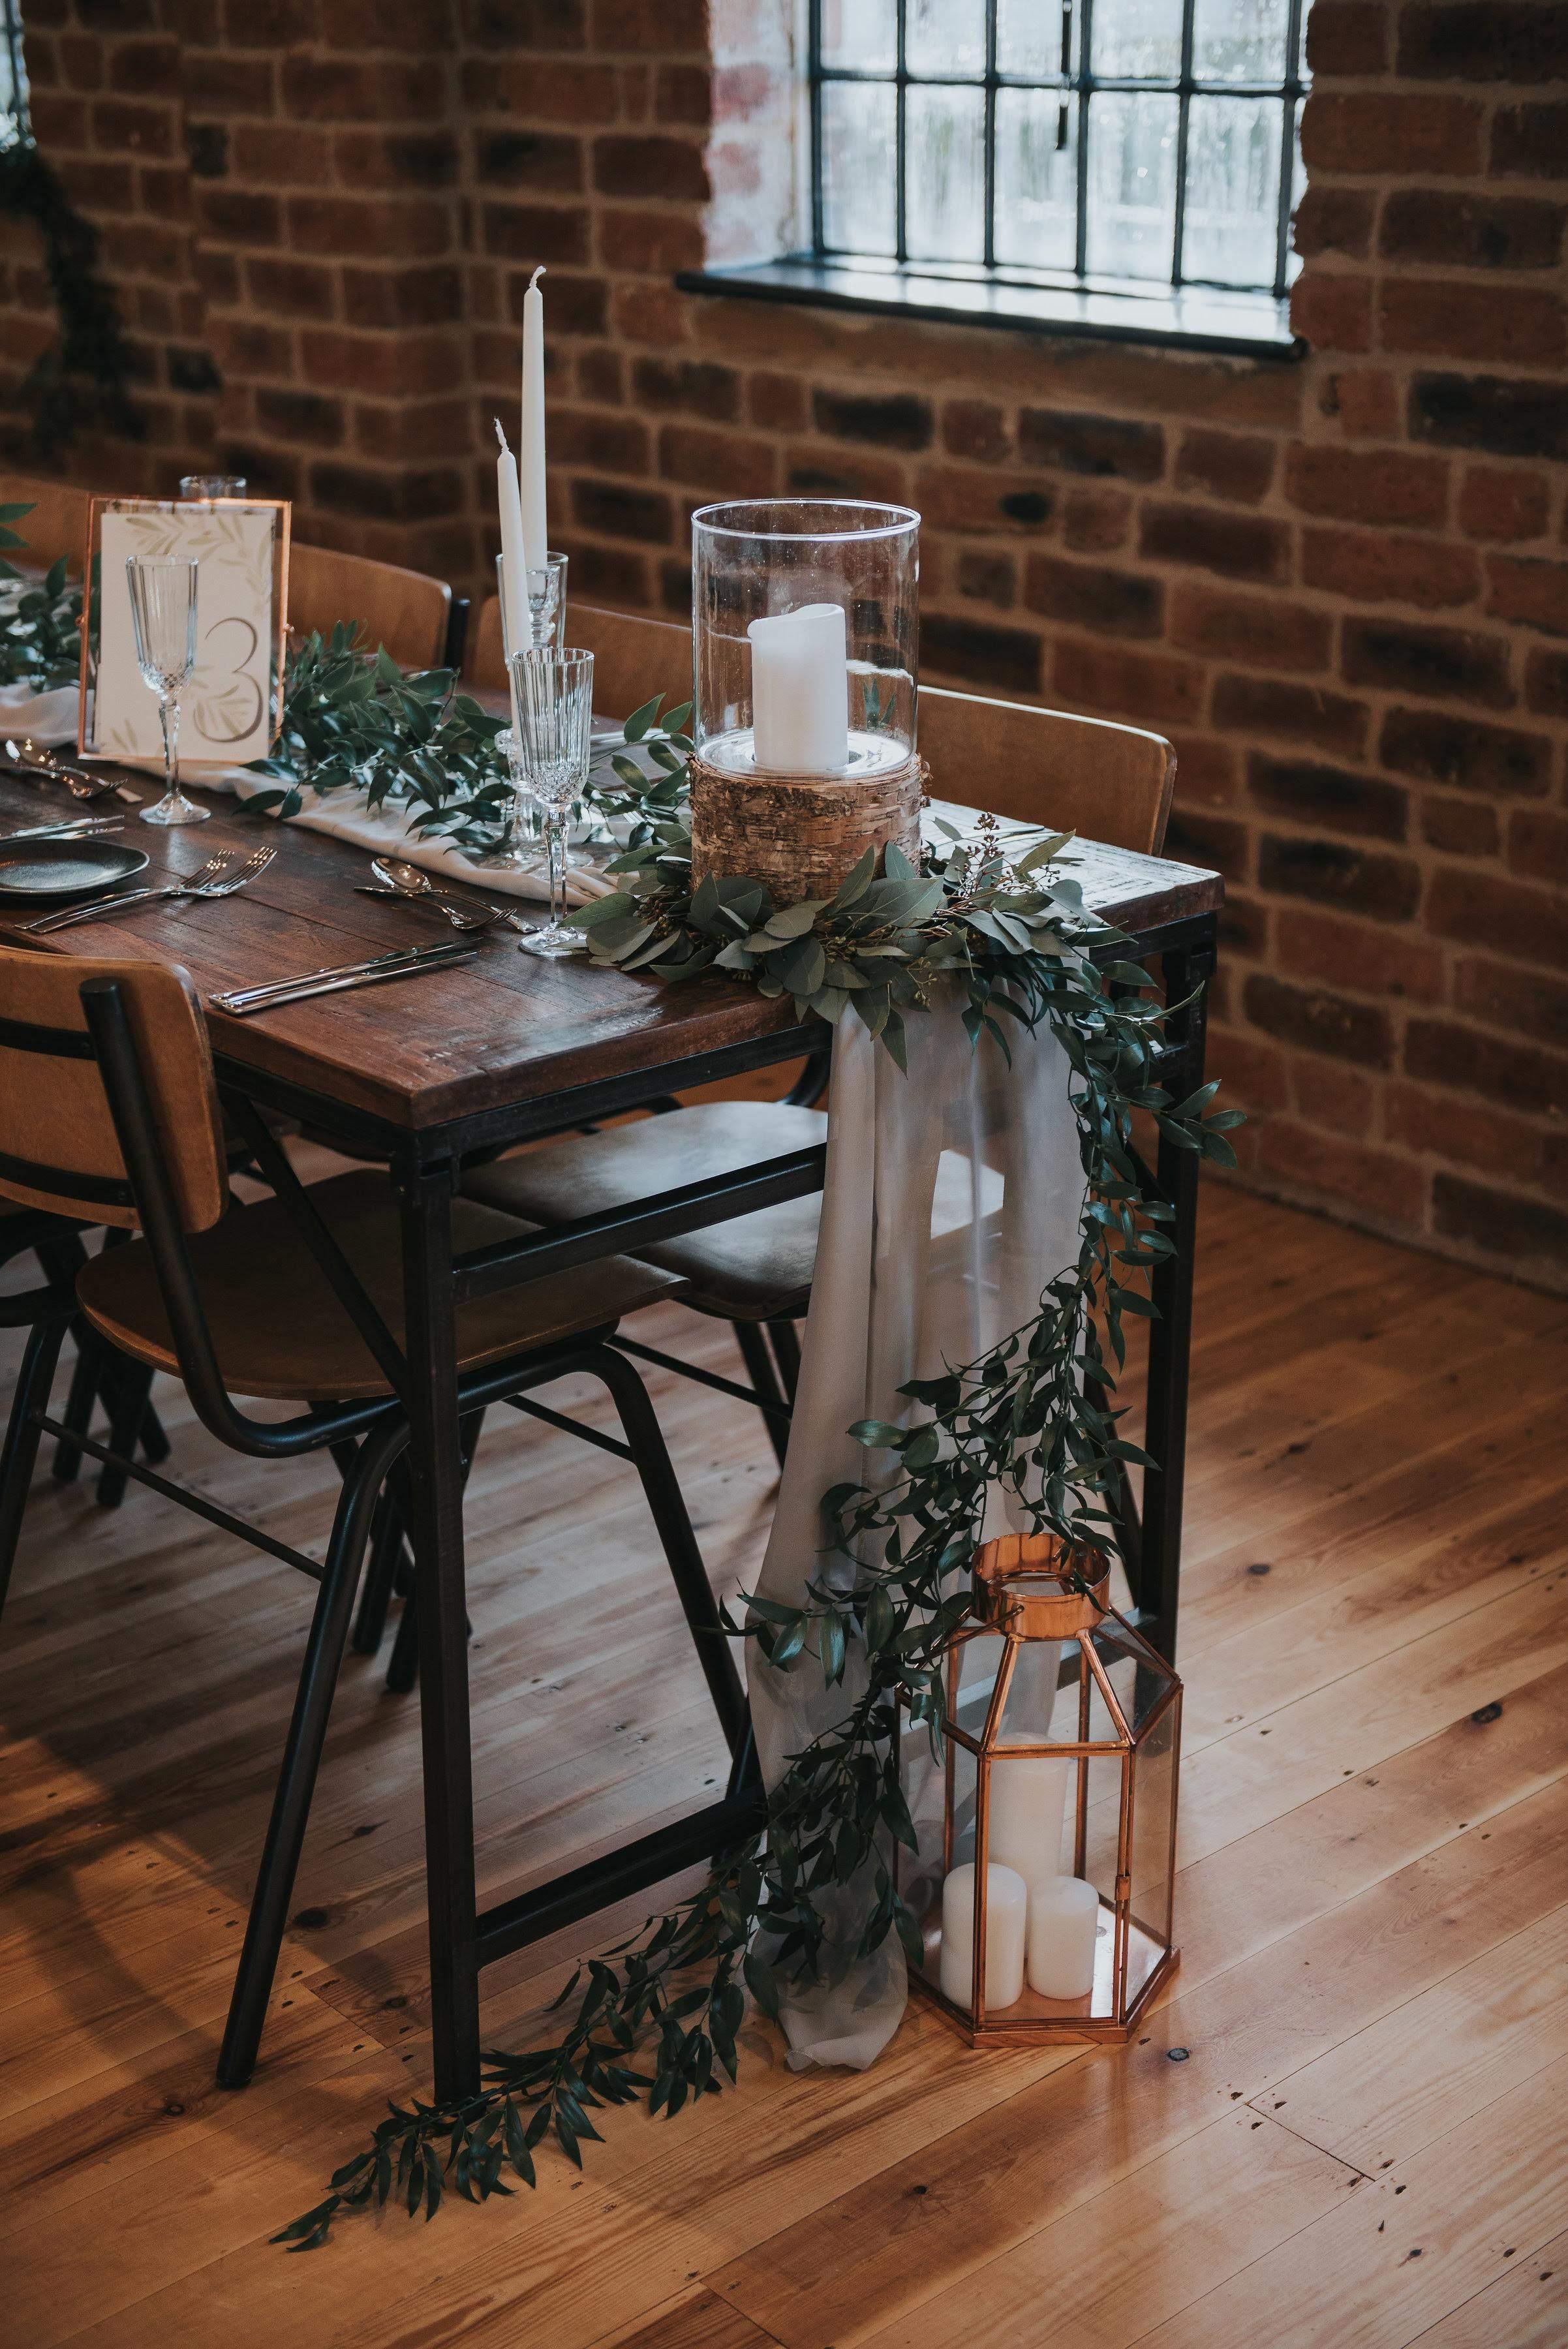 Foliage table decoration